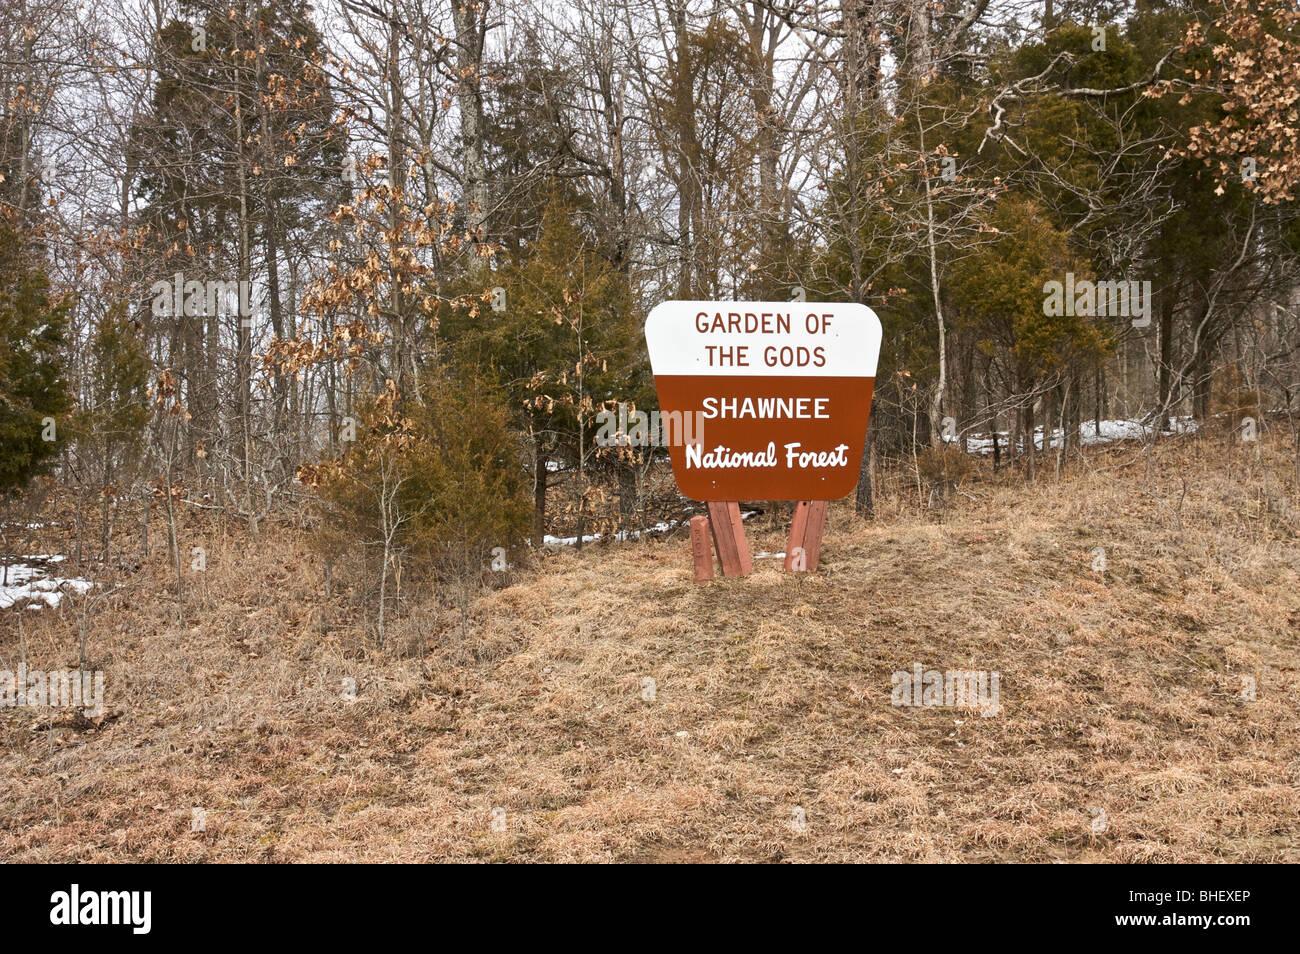 garden of the gods sign shawnee national forest illinois usa stock image - Shawnee National Forest Garden Of The Gods